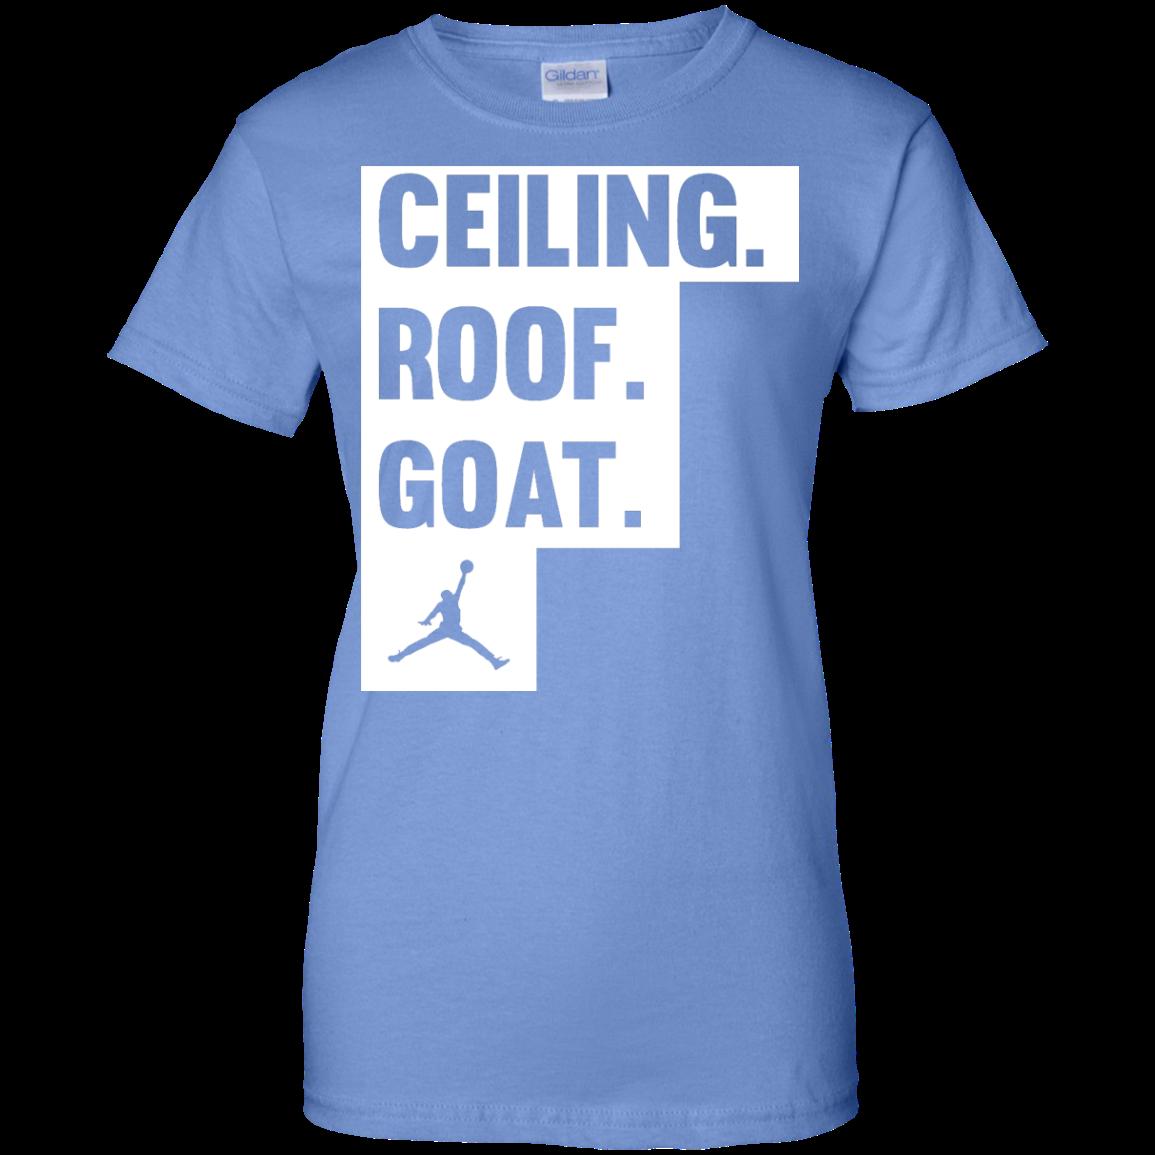 Jordan Ceiling Roof Goat T Shirt Hoodies Tank